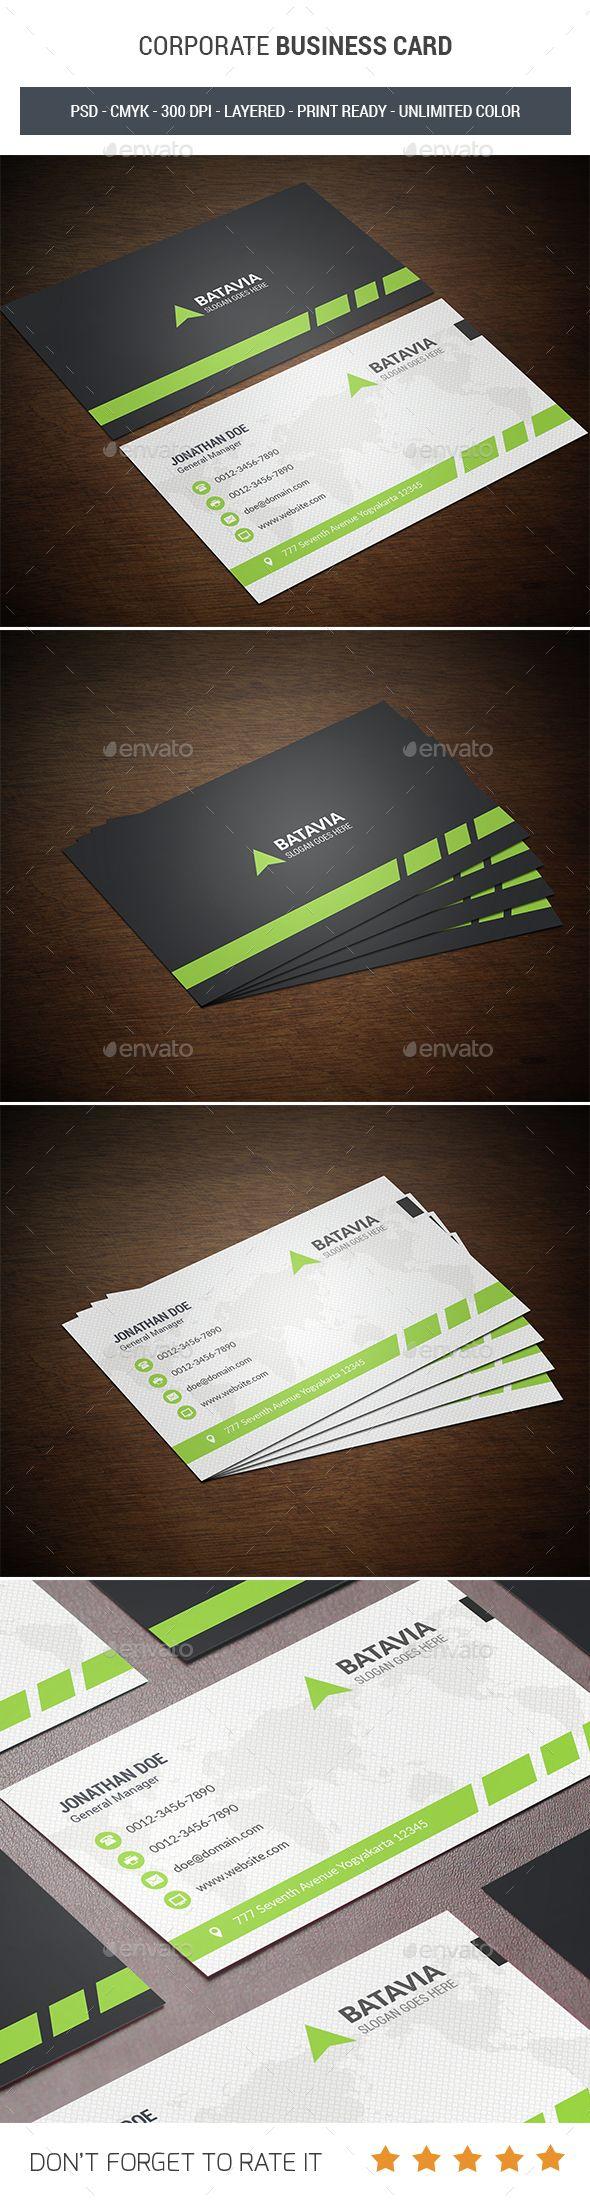 Corporate Business Card u2014 Photoshop PSD horizontal